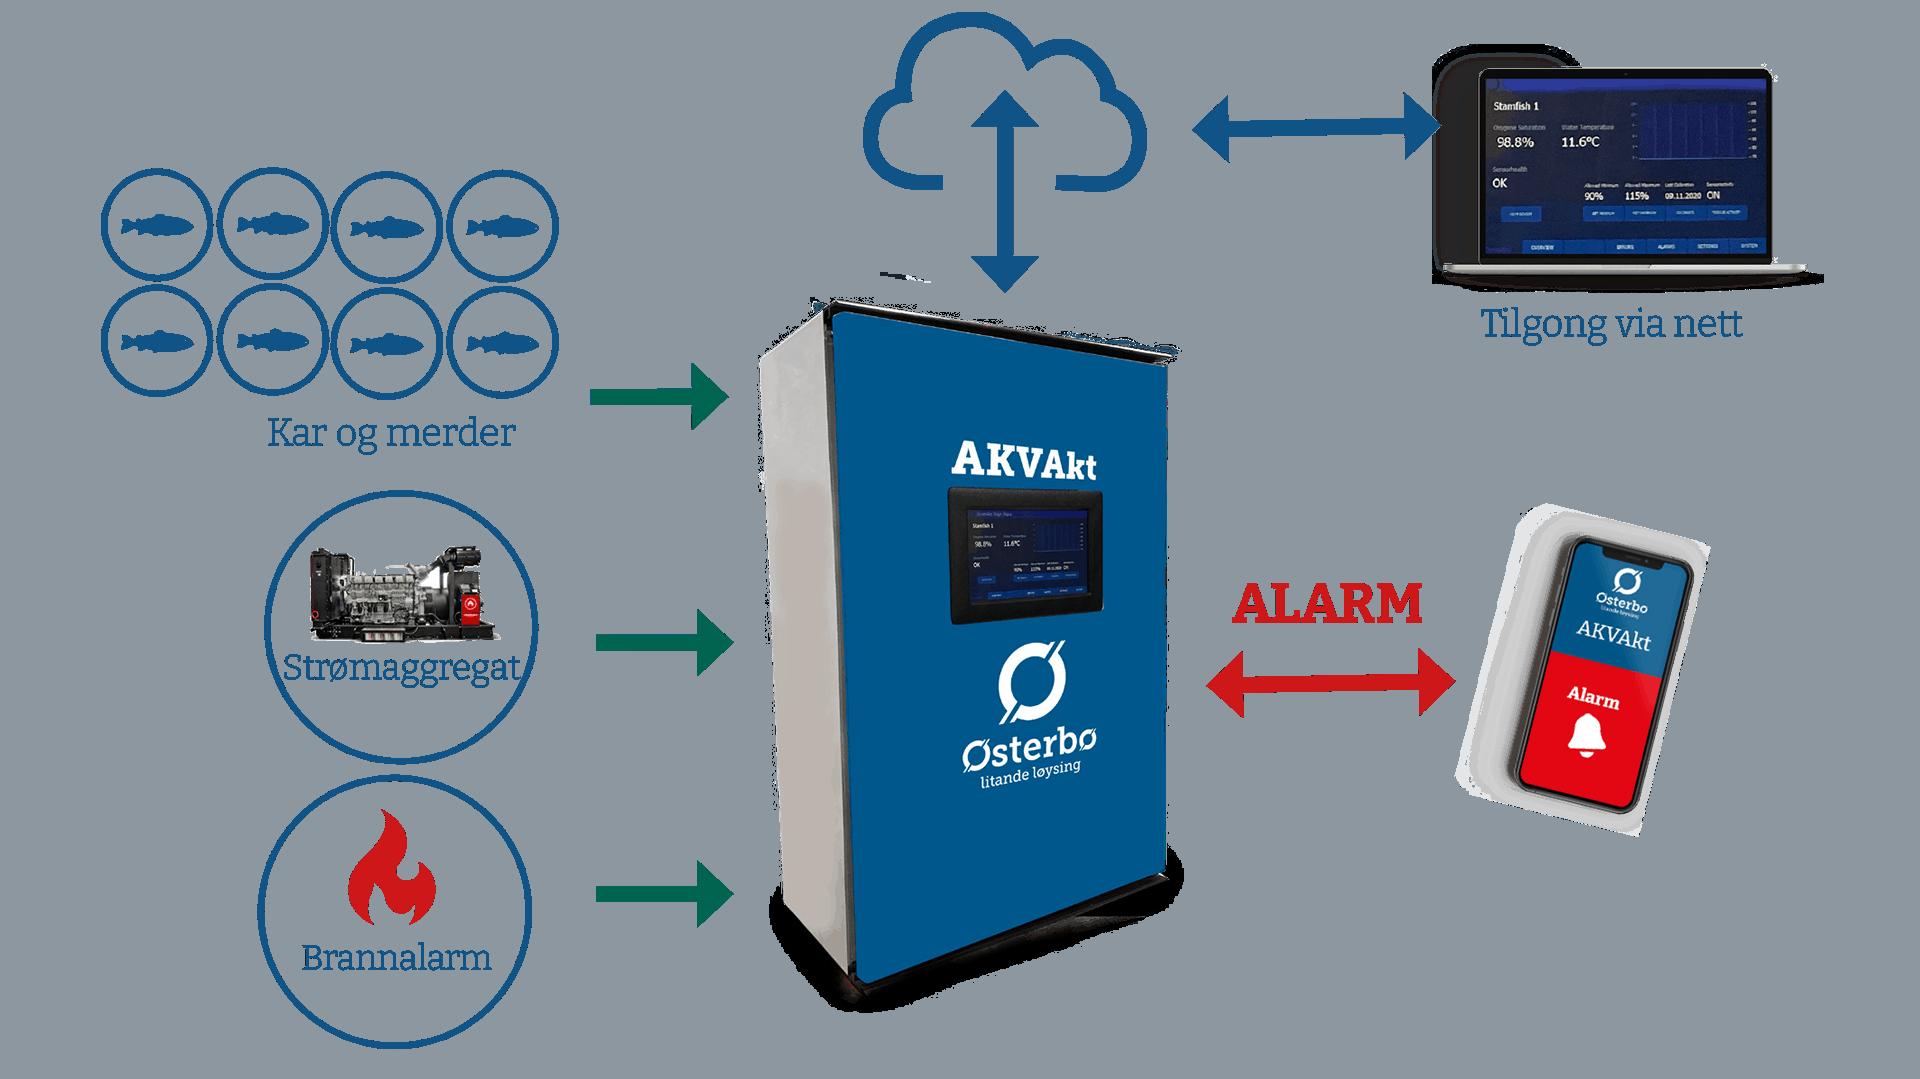 Akvakt system